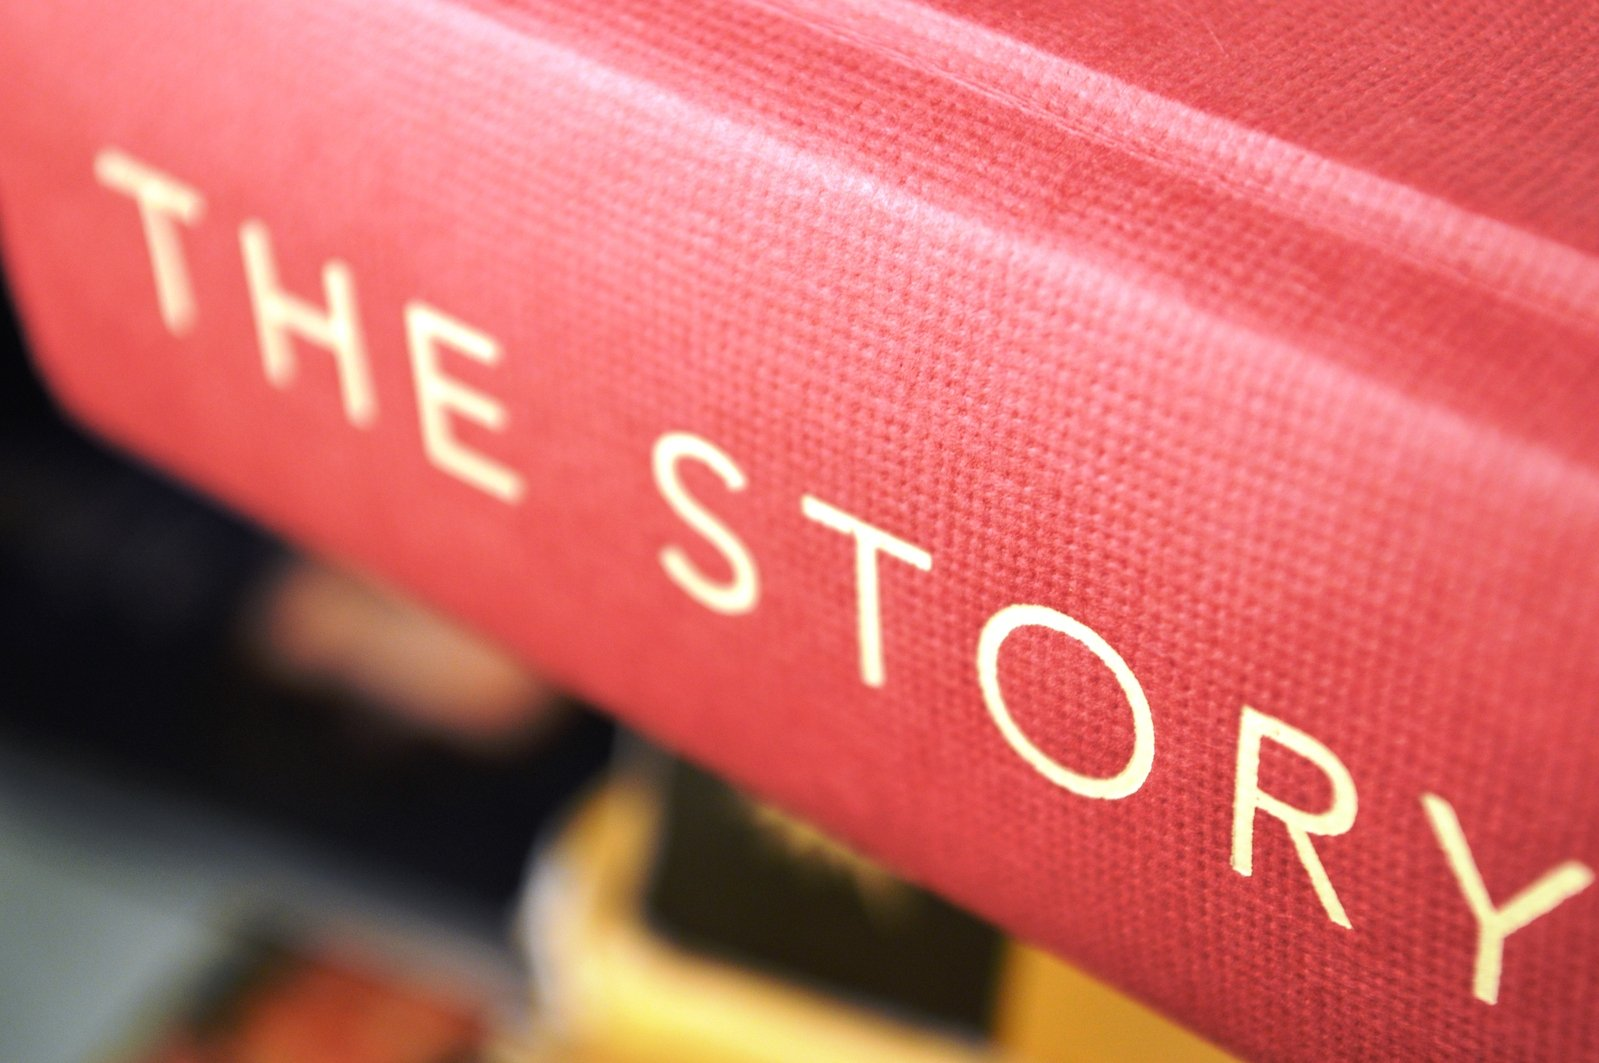 the-story-1243694.jpg